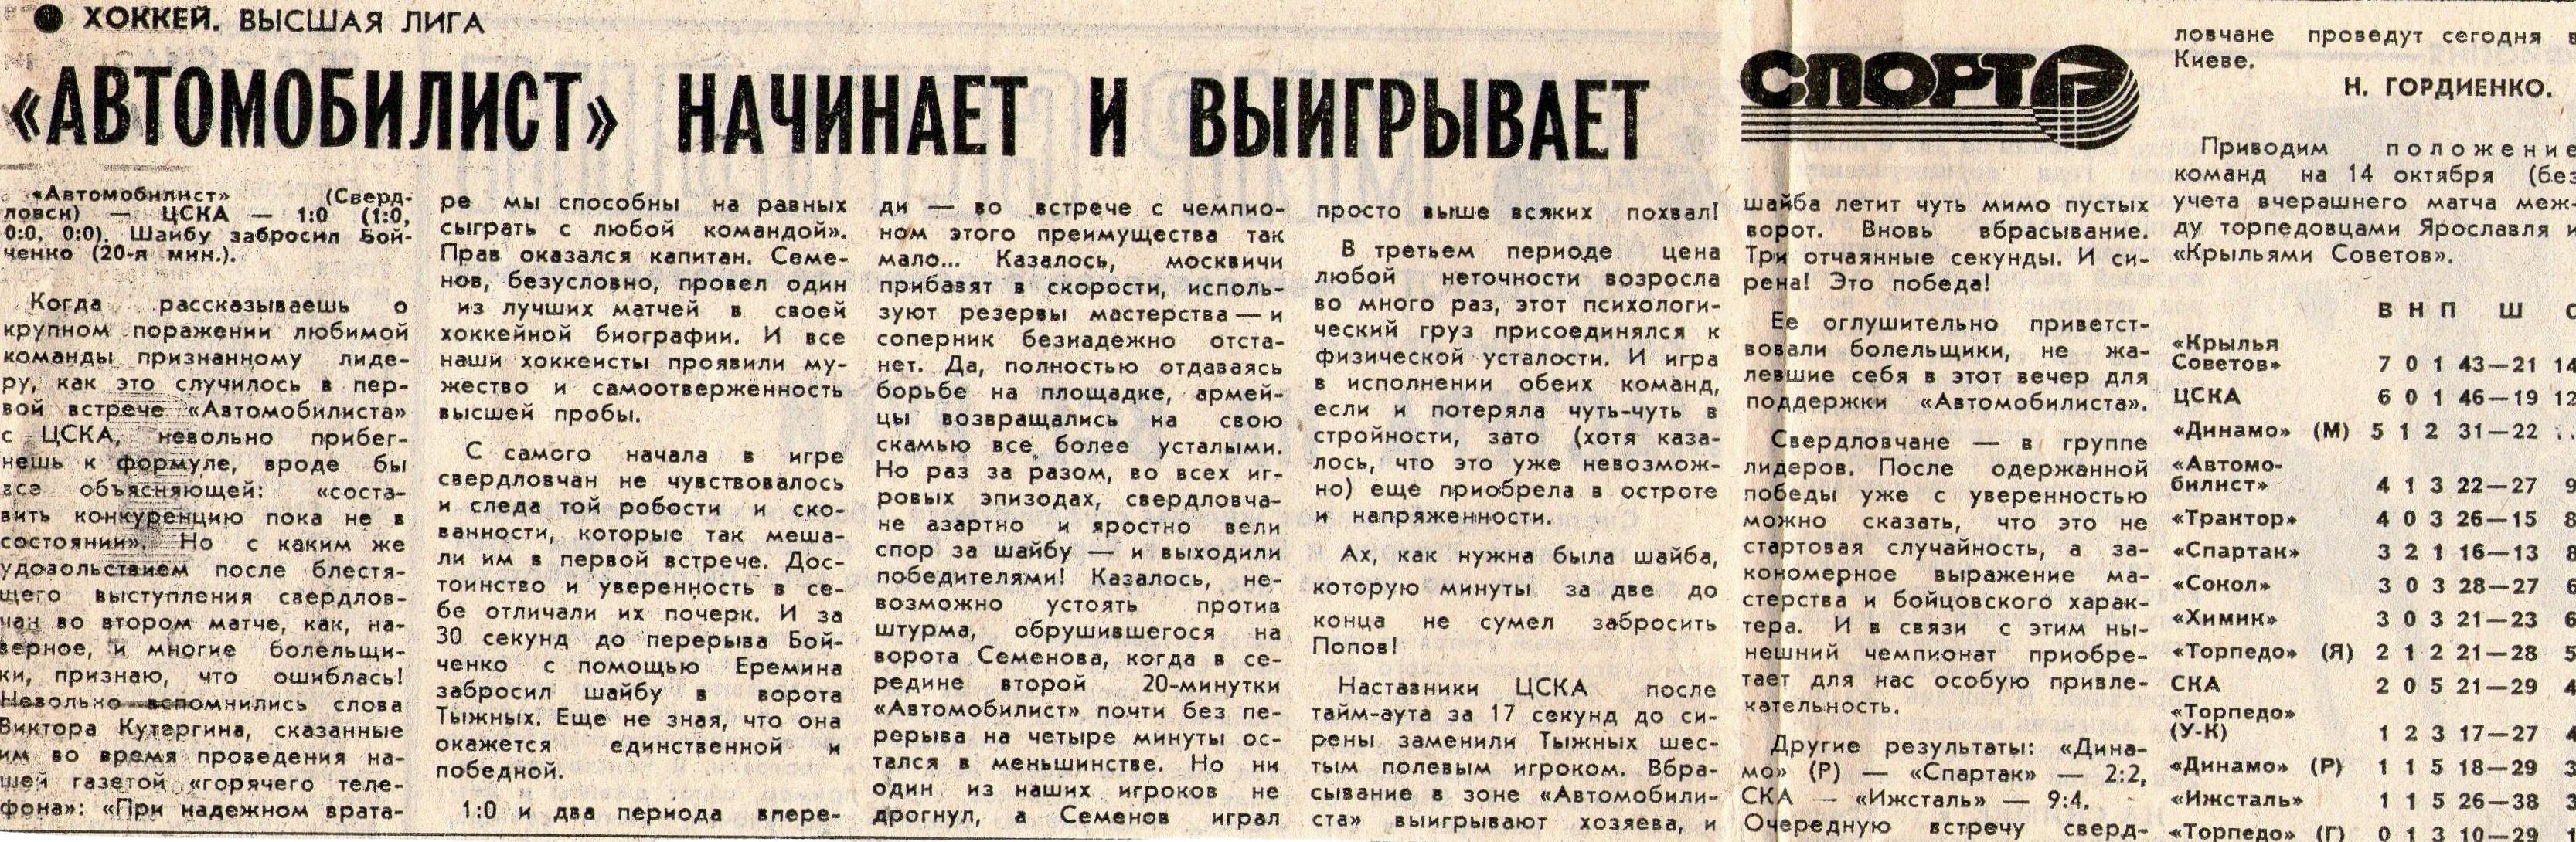 1987.10.12б Автомобилист Св. 1-0 ЦСКА.jpg